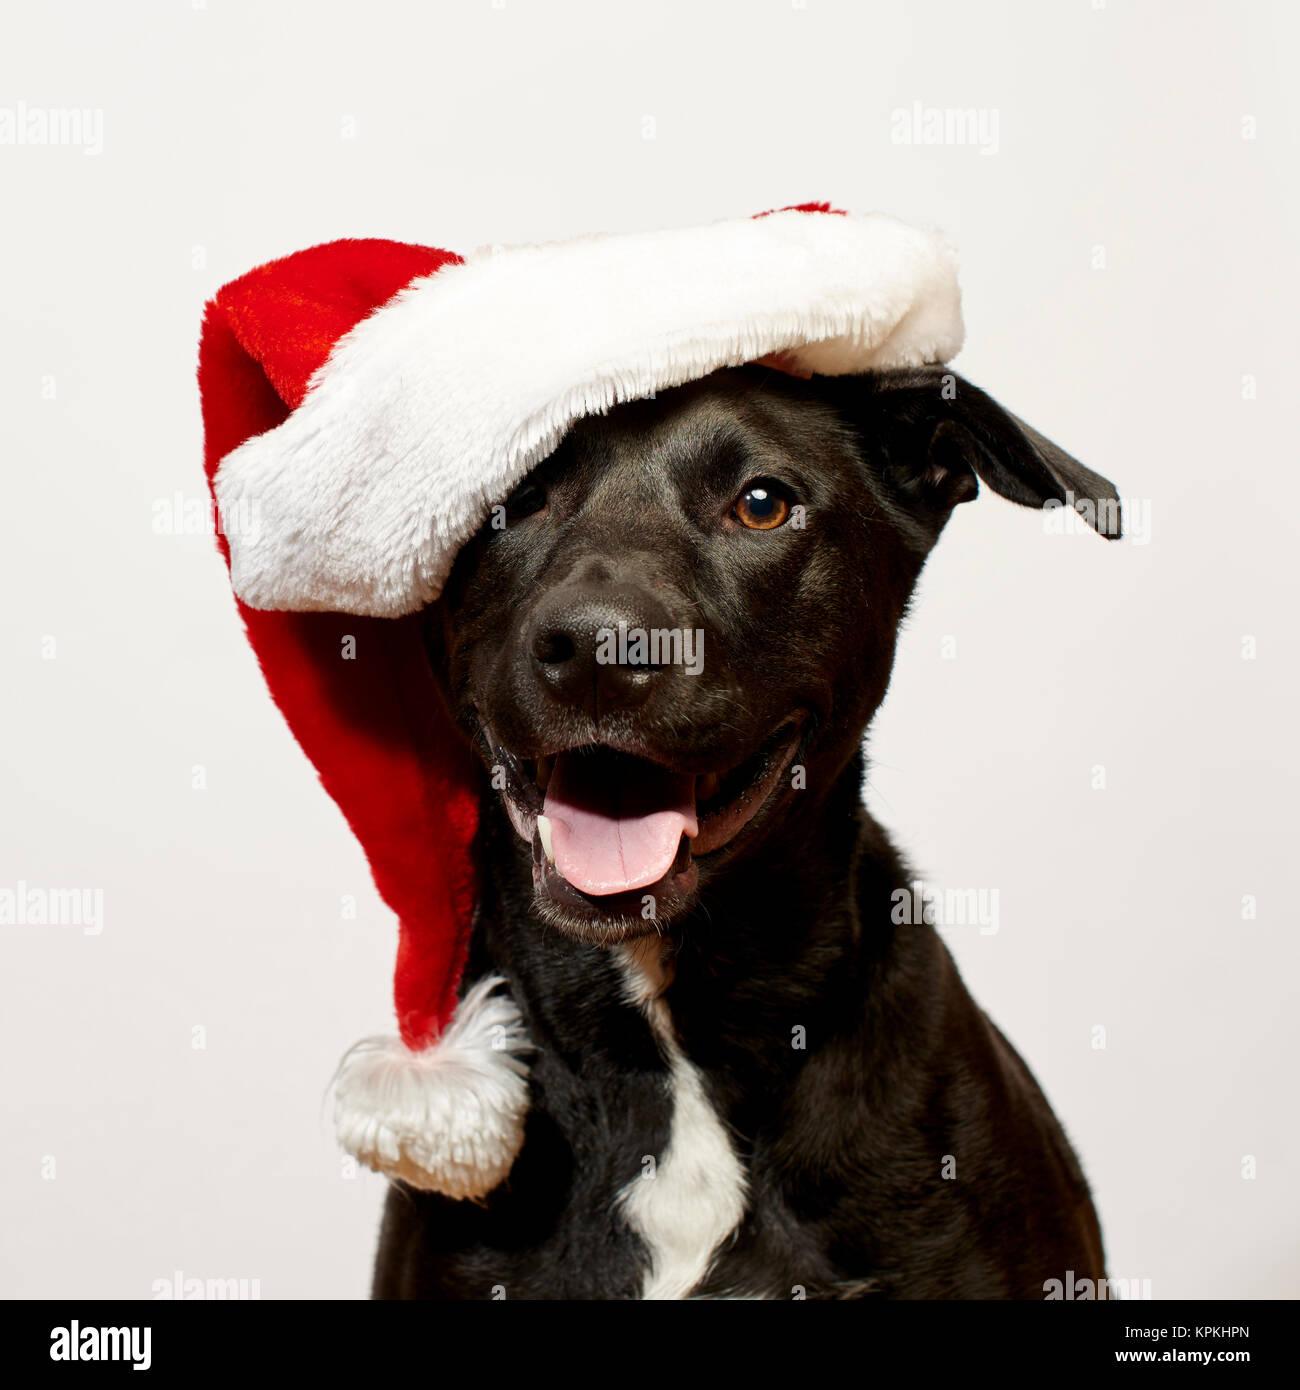 Dog close up wearing Santa Hat - Stock Image